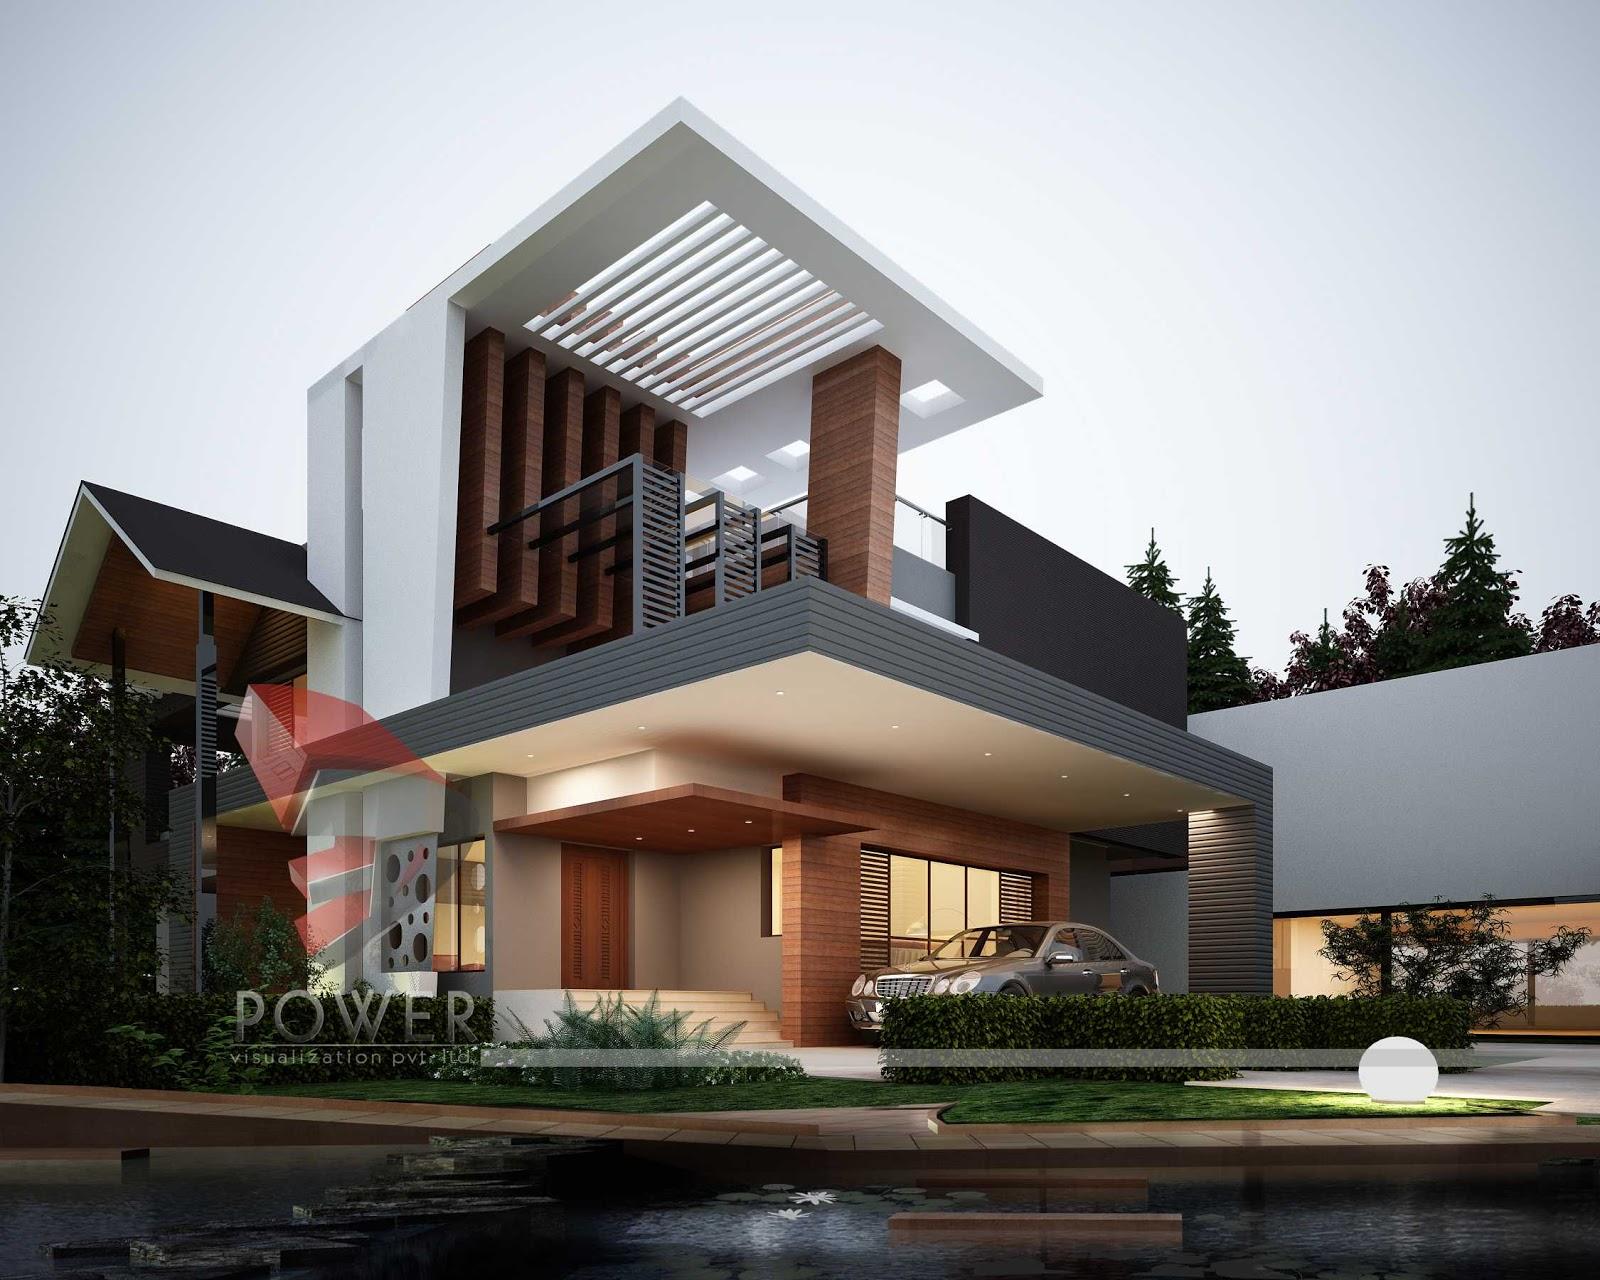 14 Architecture Home Modern House Design Images Modern Contemporary Home Design Modern Architecture And Home Modern House Designs Pictures Newdesignfile Com,Bathroom Floor Tile Design Ideas For Small Bathrooms